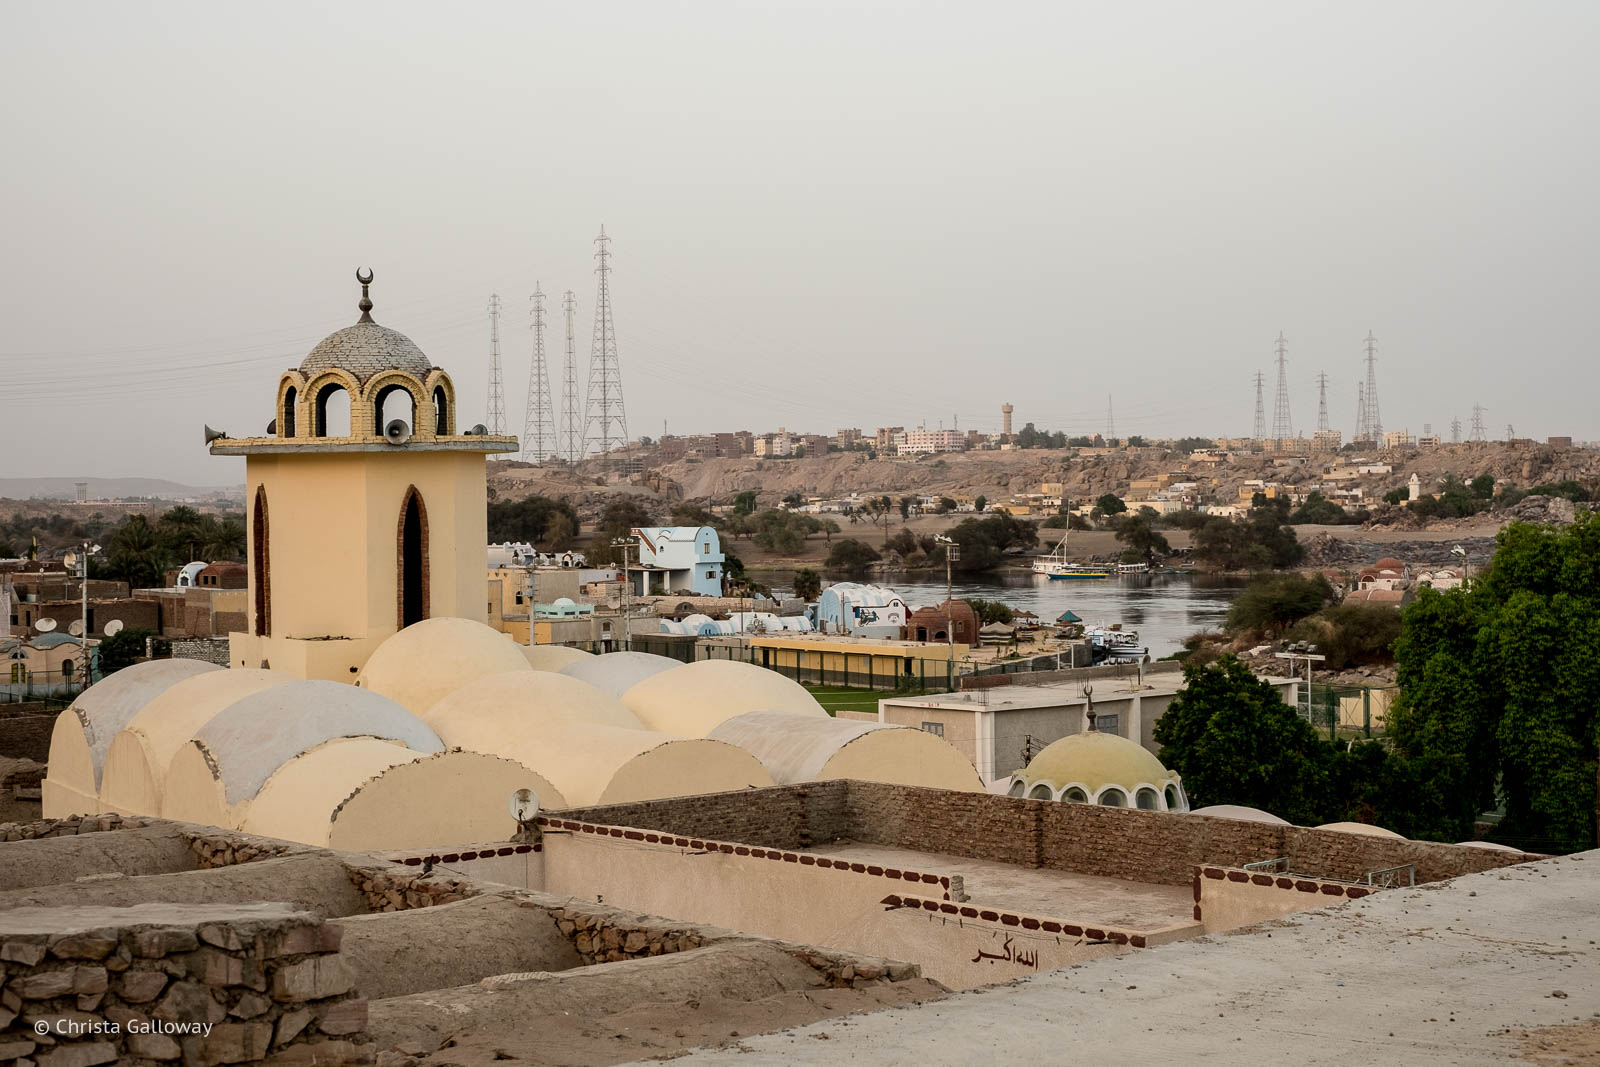 Nubian-Village-Aswan-Egypt-ckgalloway-6145.jpg